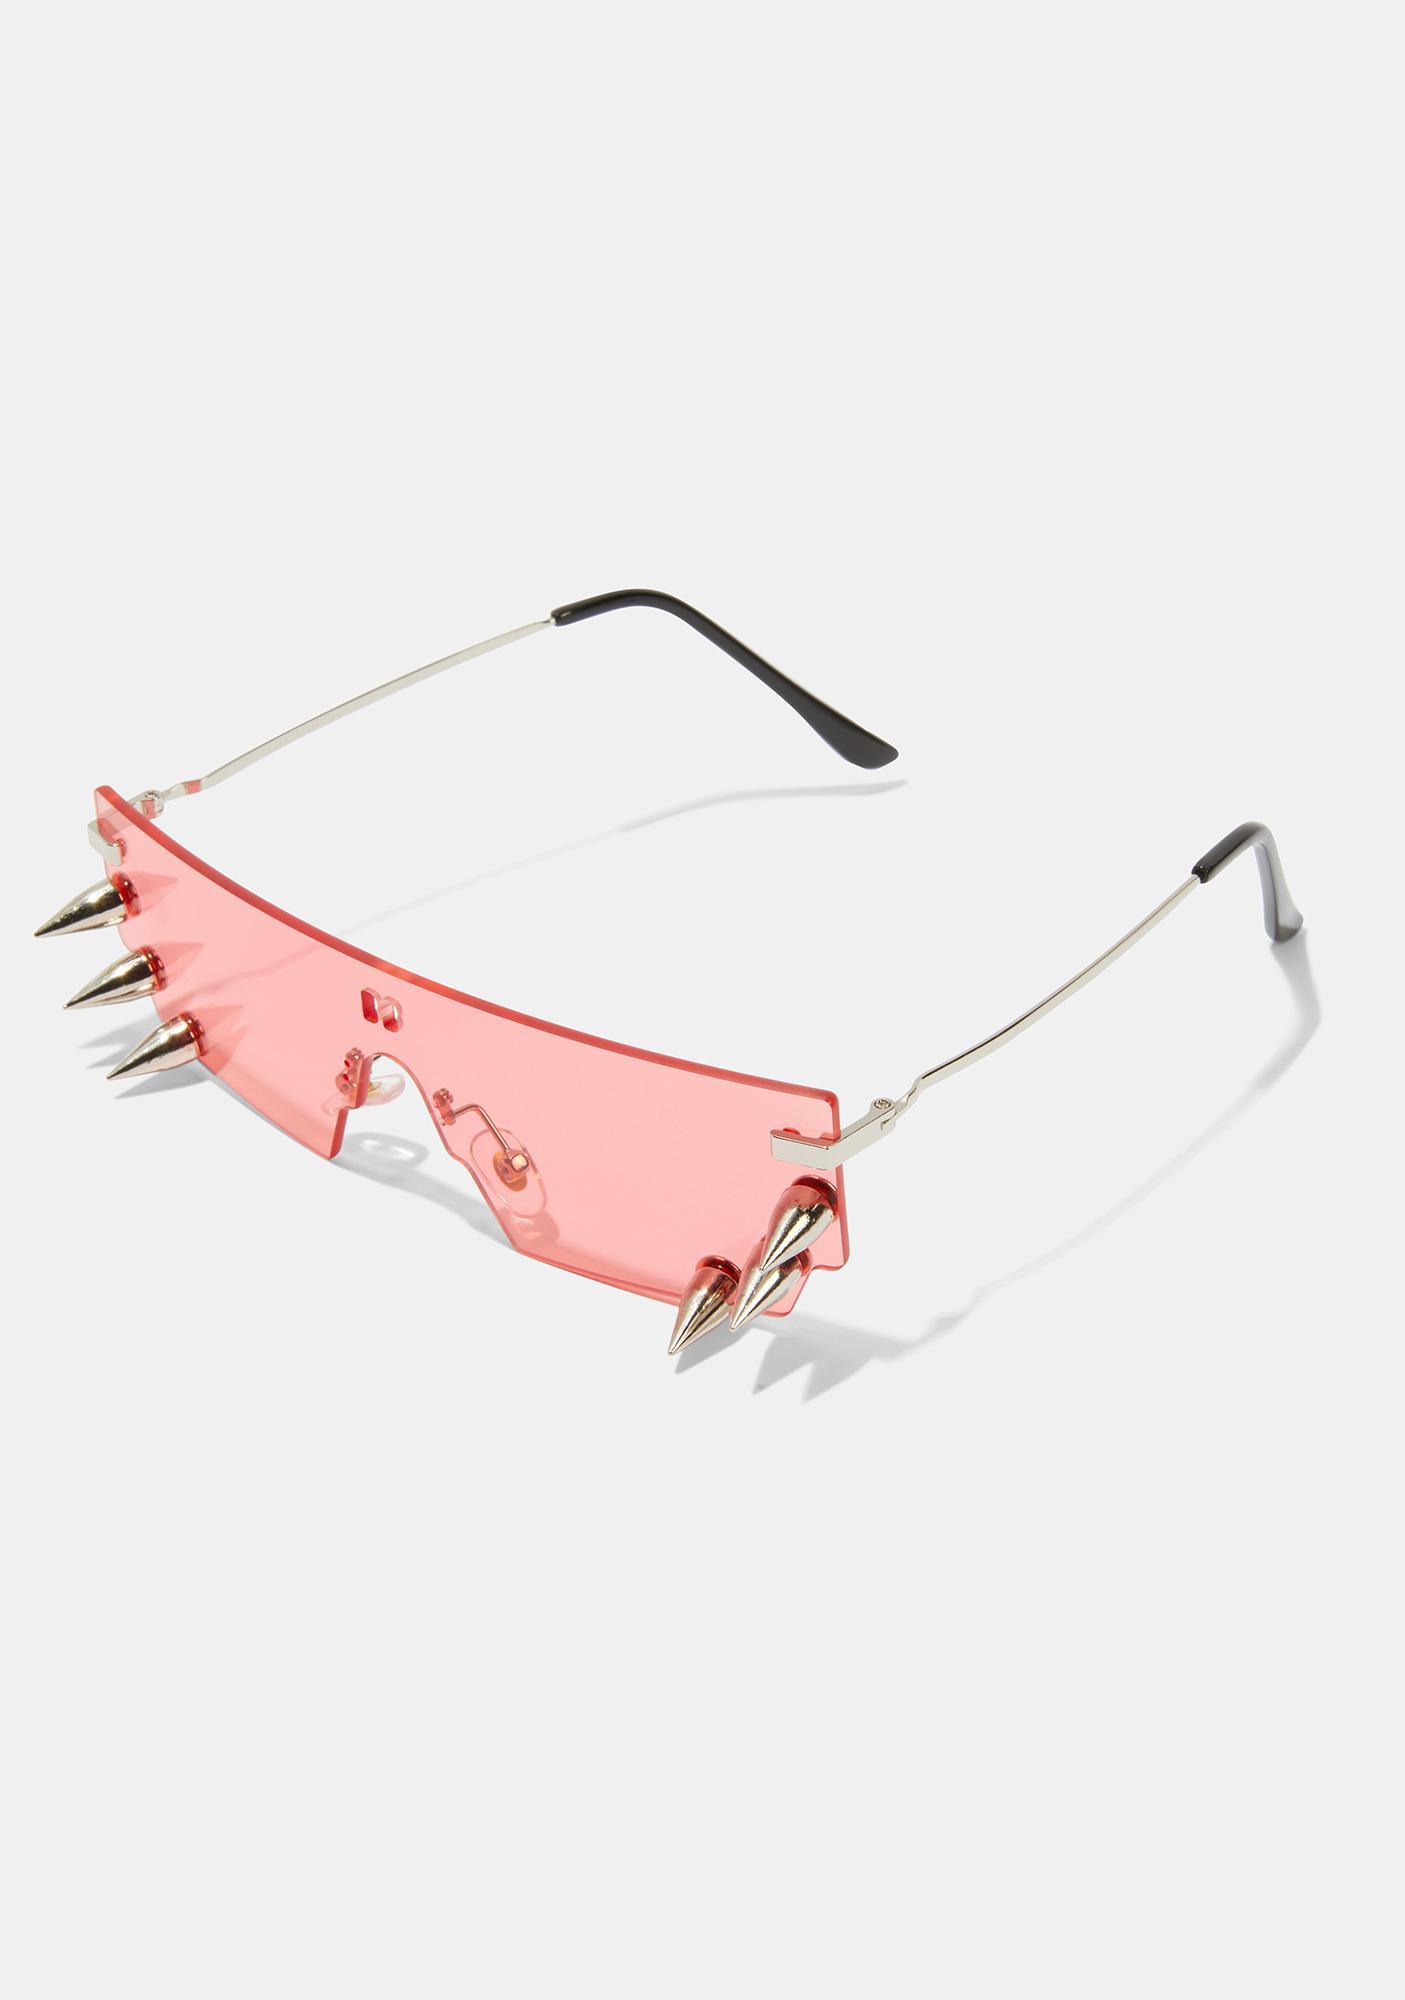 Spike Punk Sunglasses